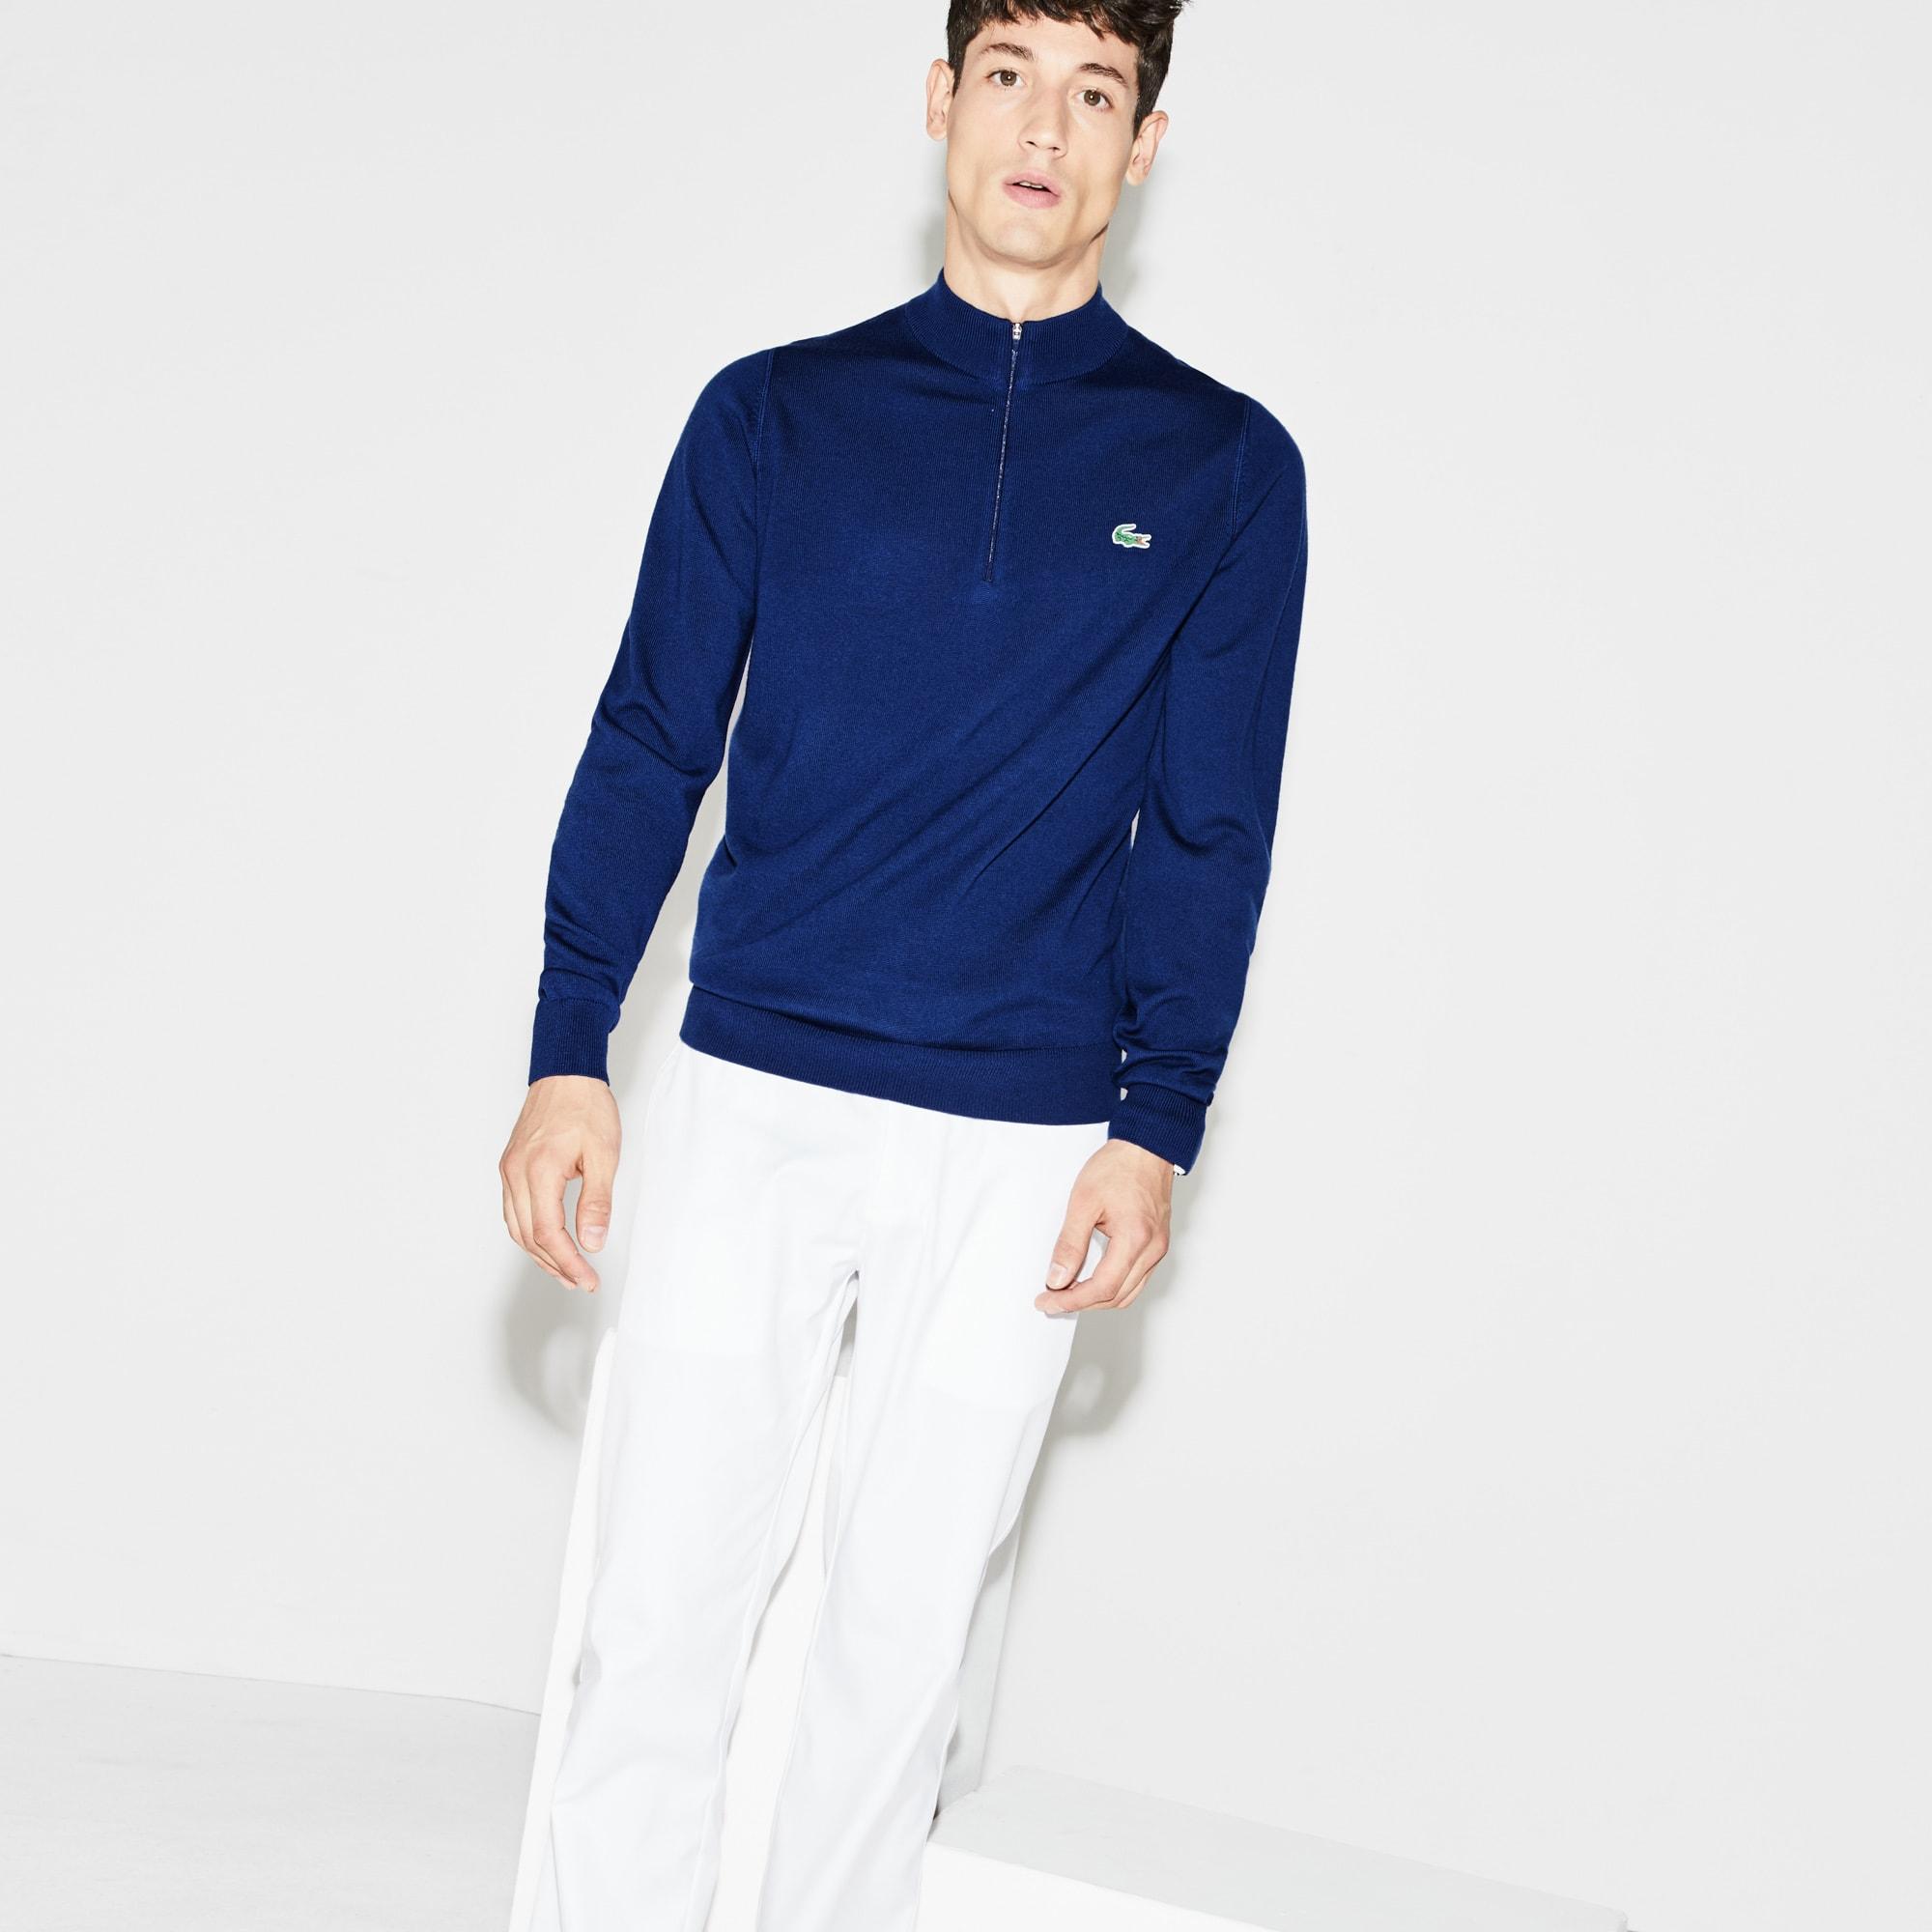 Men's SPORT Zip Stand-Up Neck Wool Jersey Golf Sweater